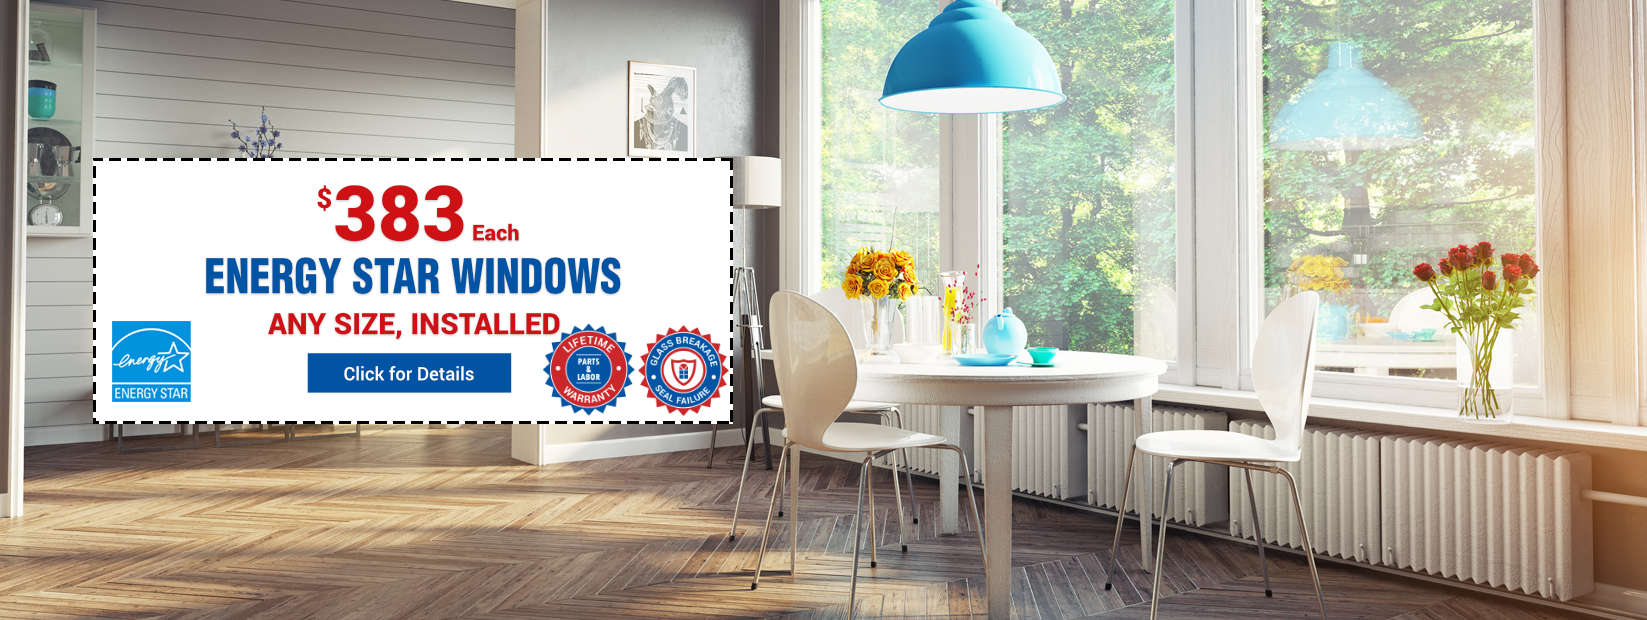 Energy Star Windows at $383